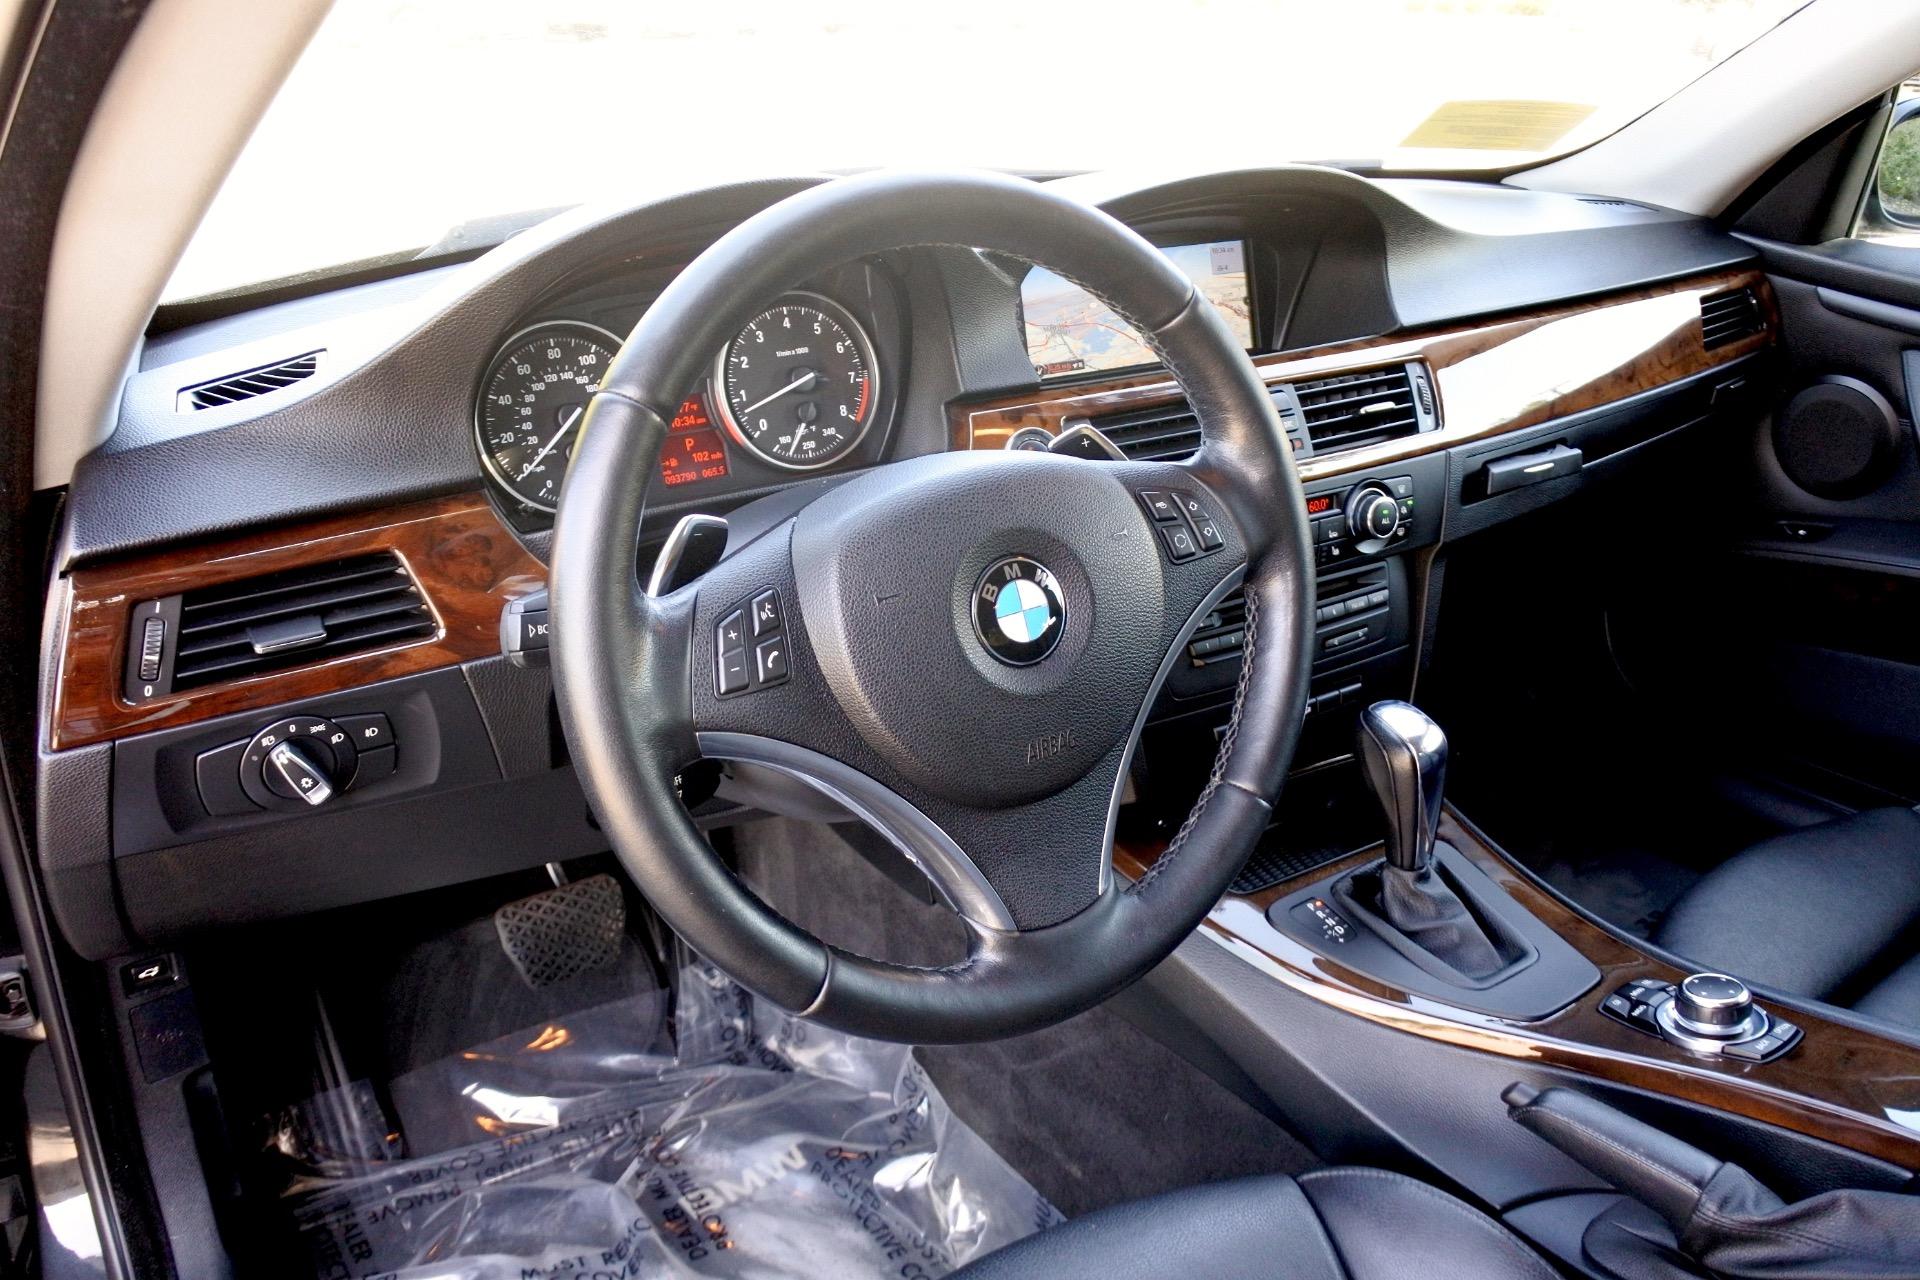 Used 2011 BMW 3 Series 335i xDrive AWD Used 2011 BMW 3 Series 335i xDrive AWD for sale  at Metro West Motorcars LLC in Shrewsbury MA 13